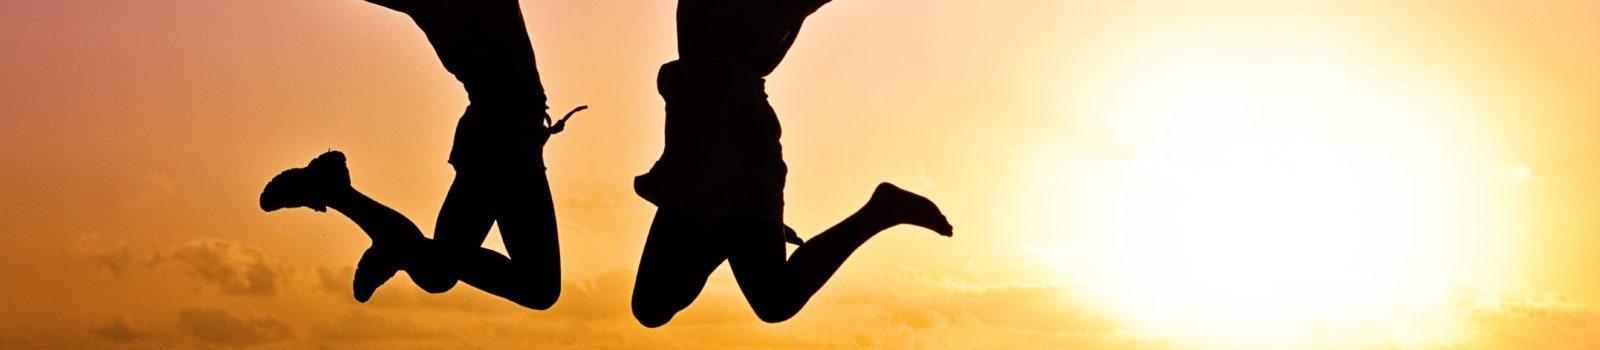 ways-pilates-improves-life